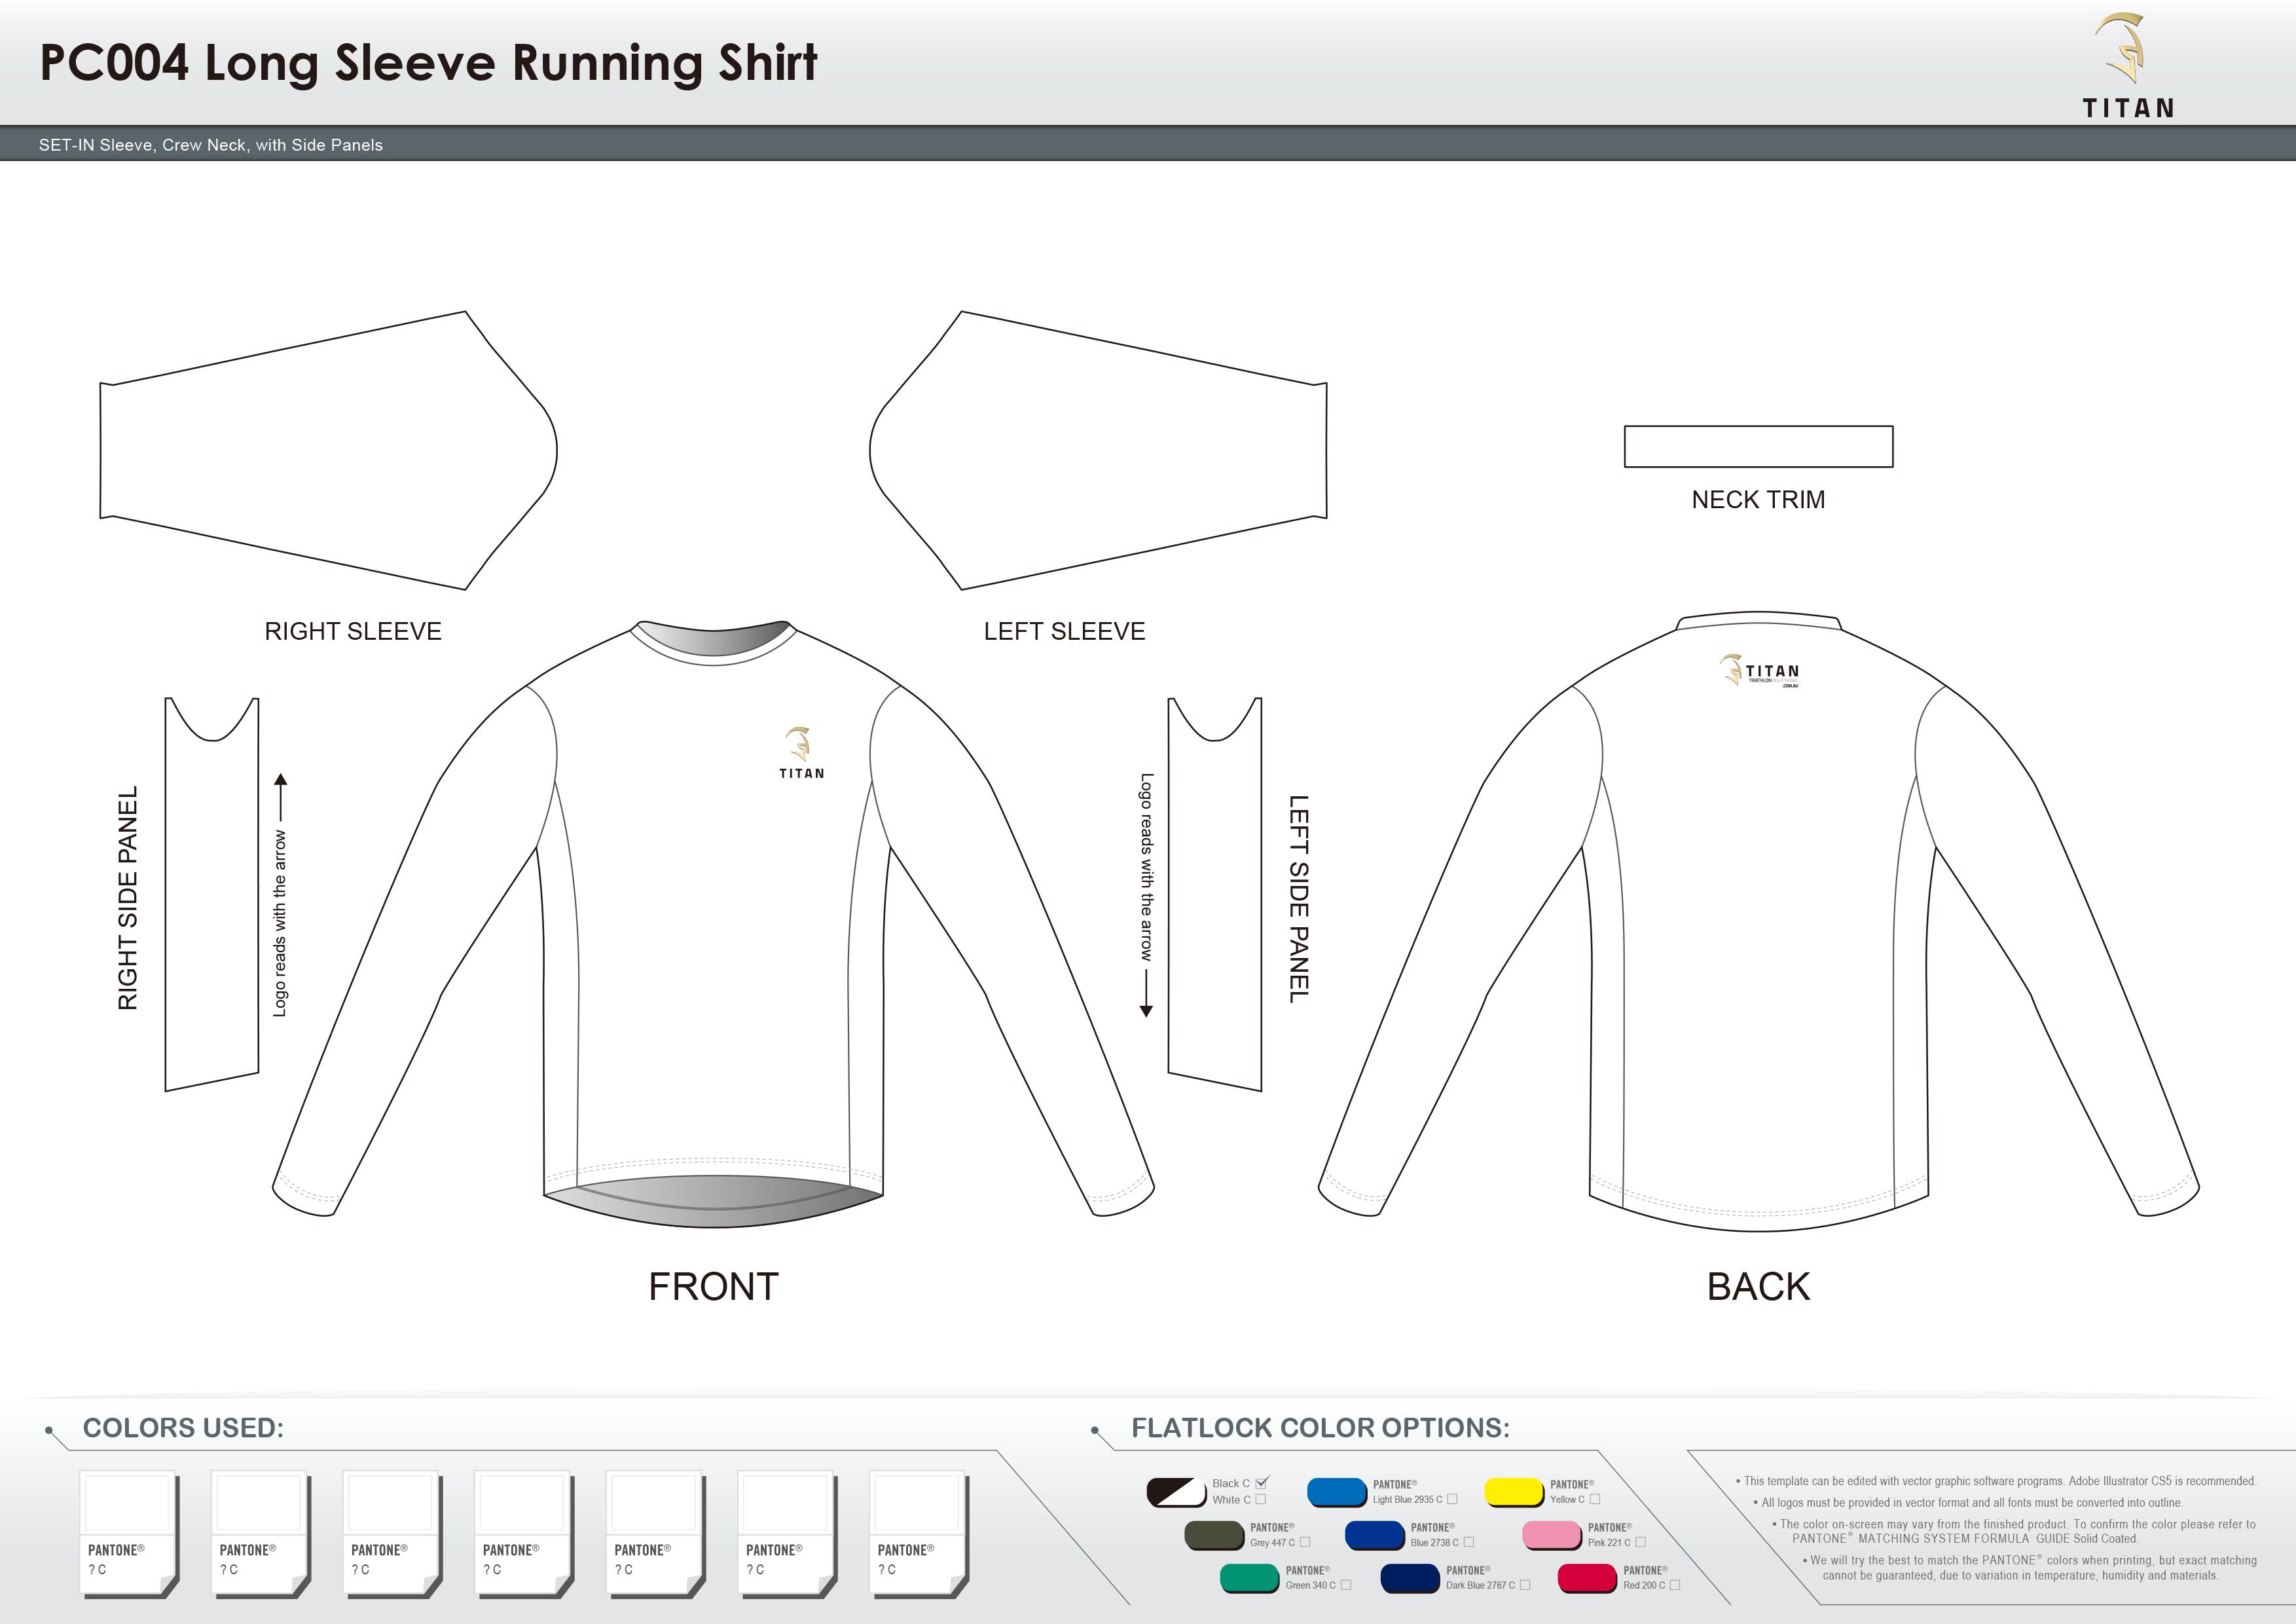 PC004 Long Sleeve Running Shirt